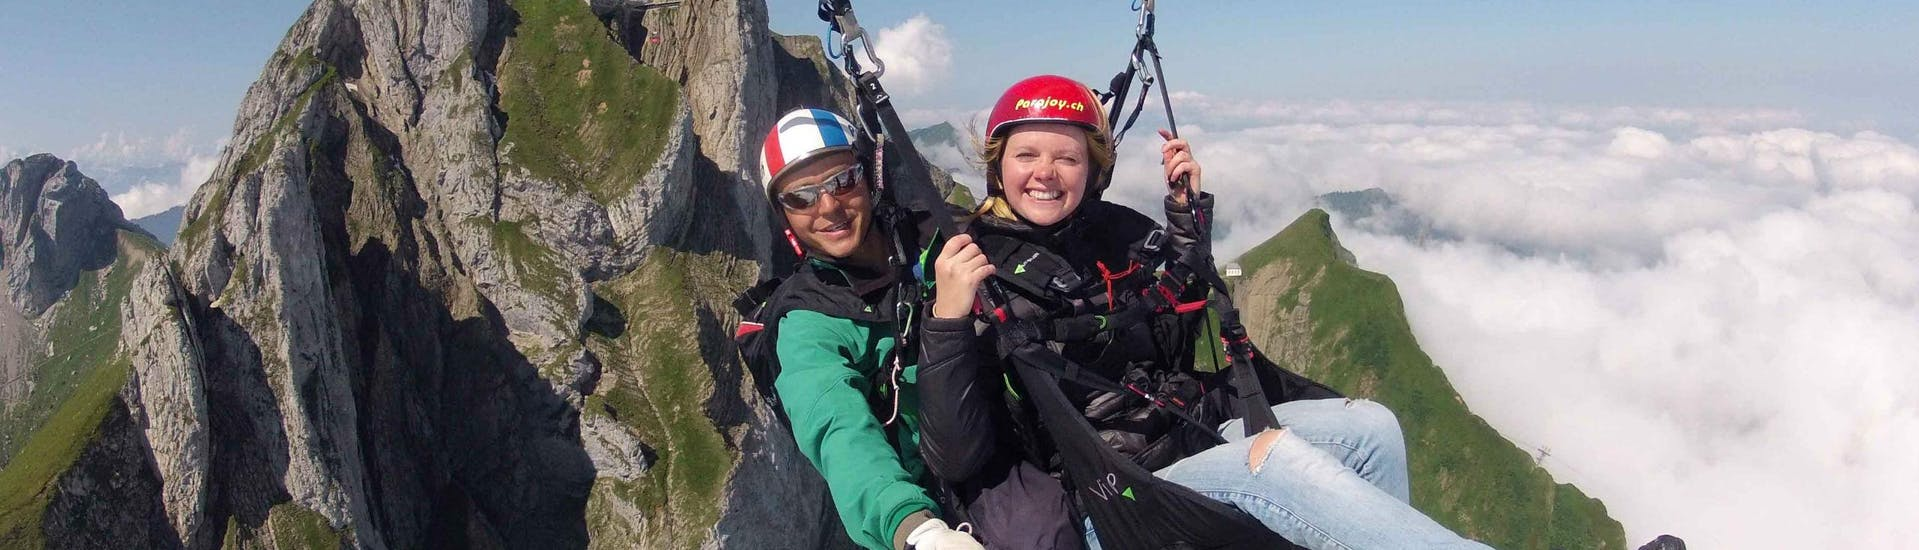 tandem-paragliding-from-the-pilatus-high-flyer-tandemflug-ch-hero